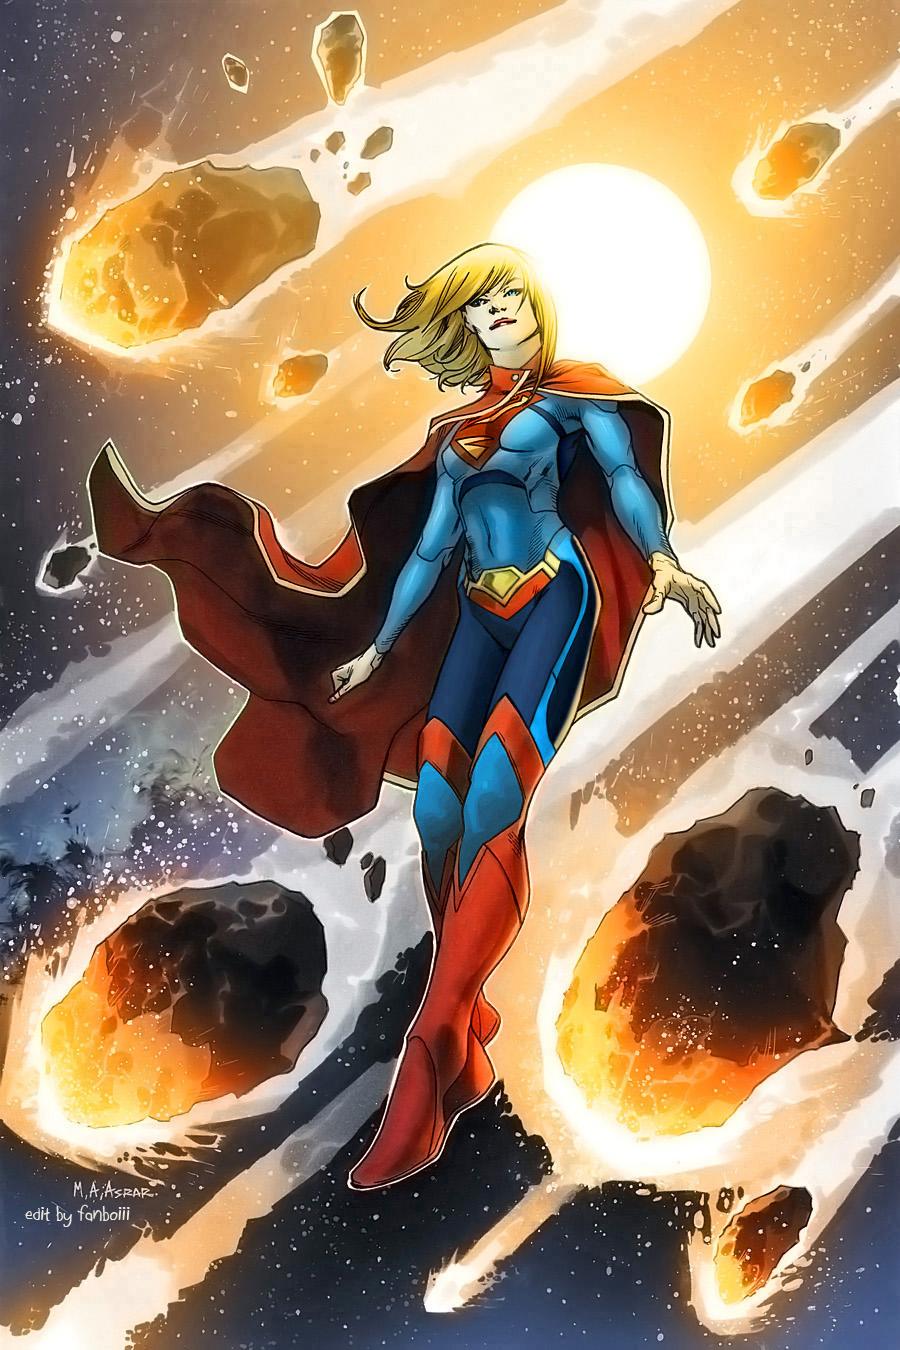 http://fc03.deviantart.net/fs70/f/2013/031/8/5/supergirl___dc_new_52_revised_costume_design_by_fanboiii-d4fj52o.jpg